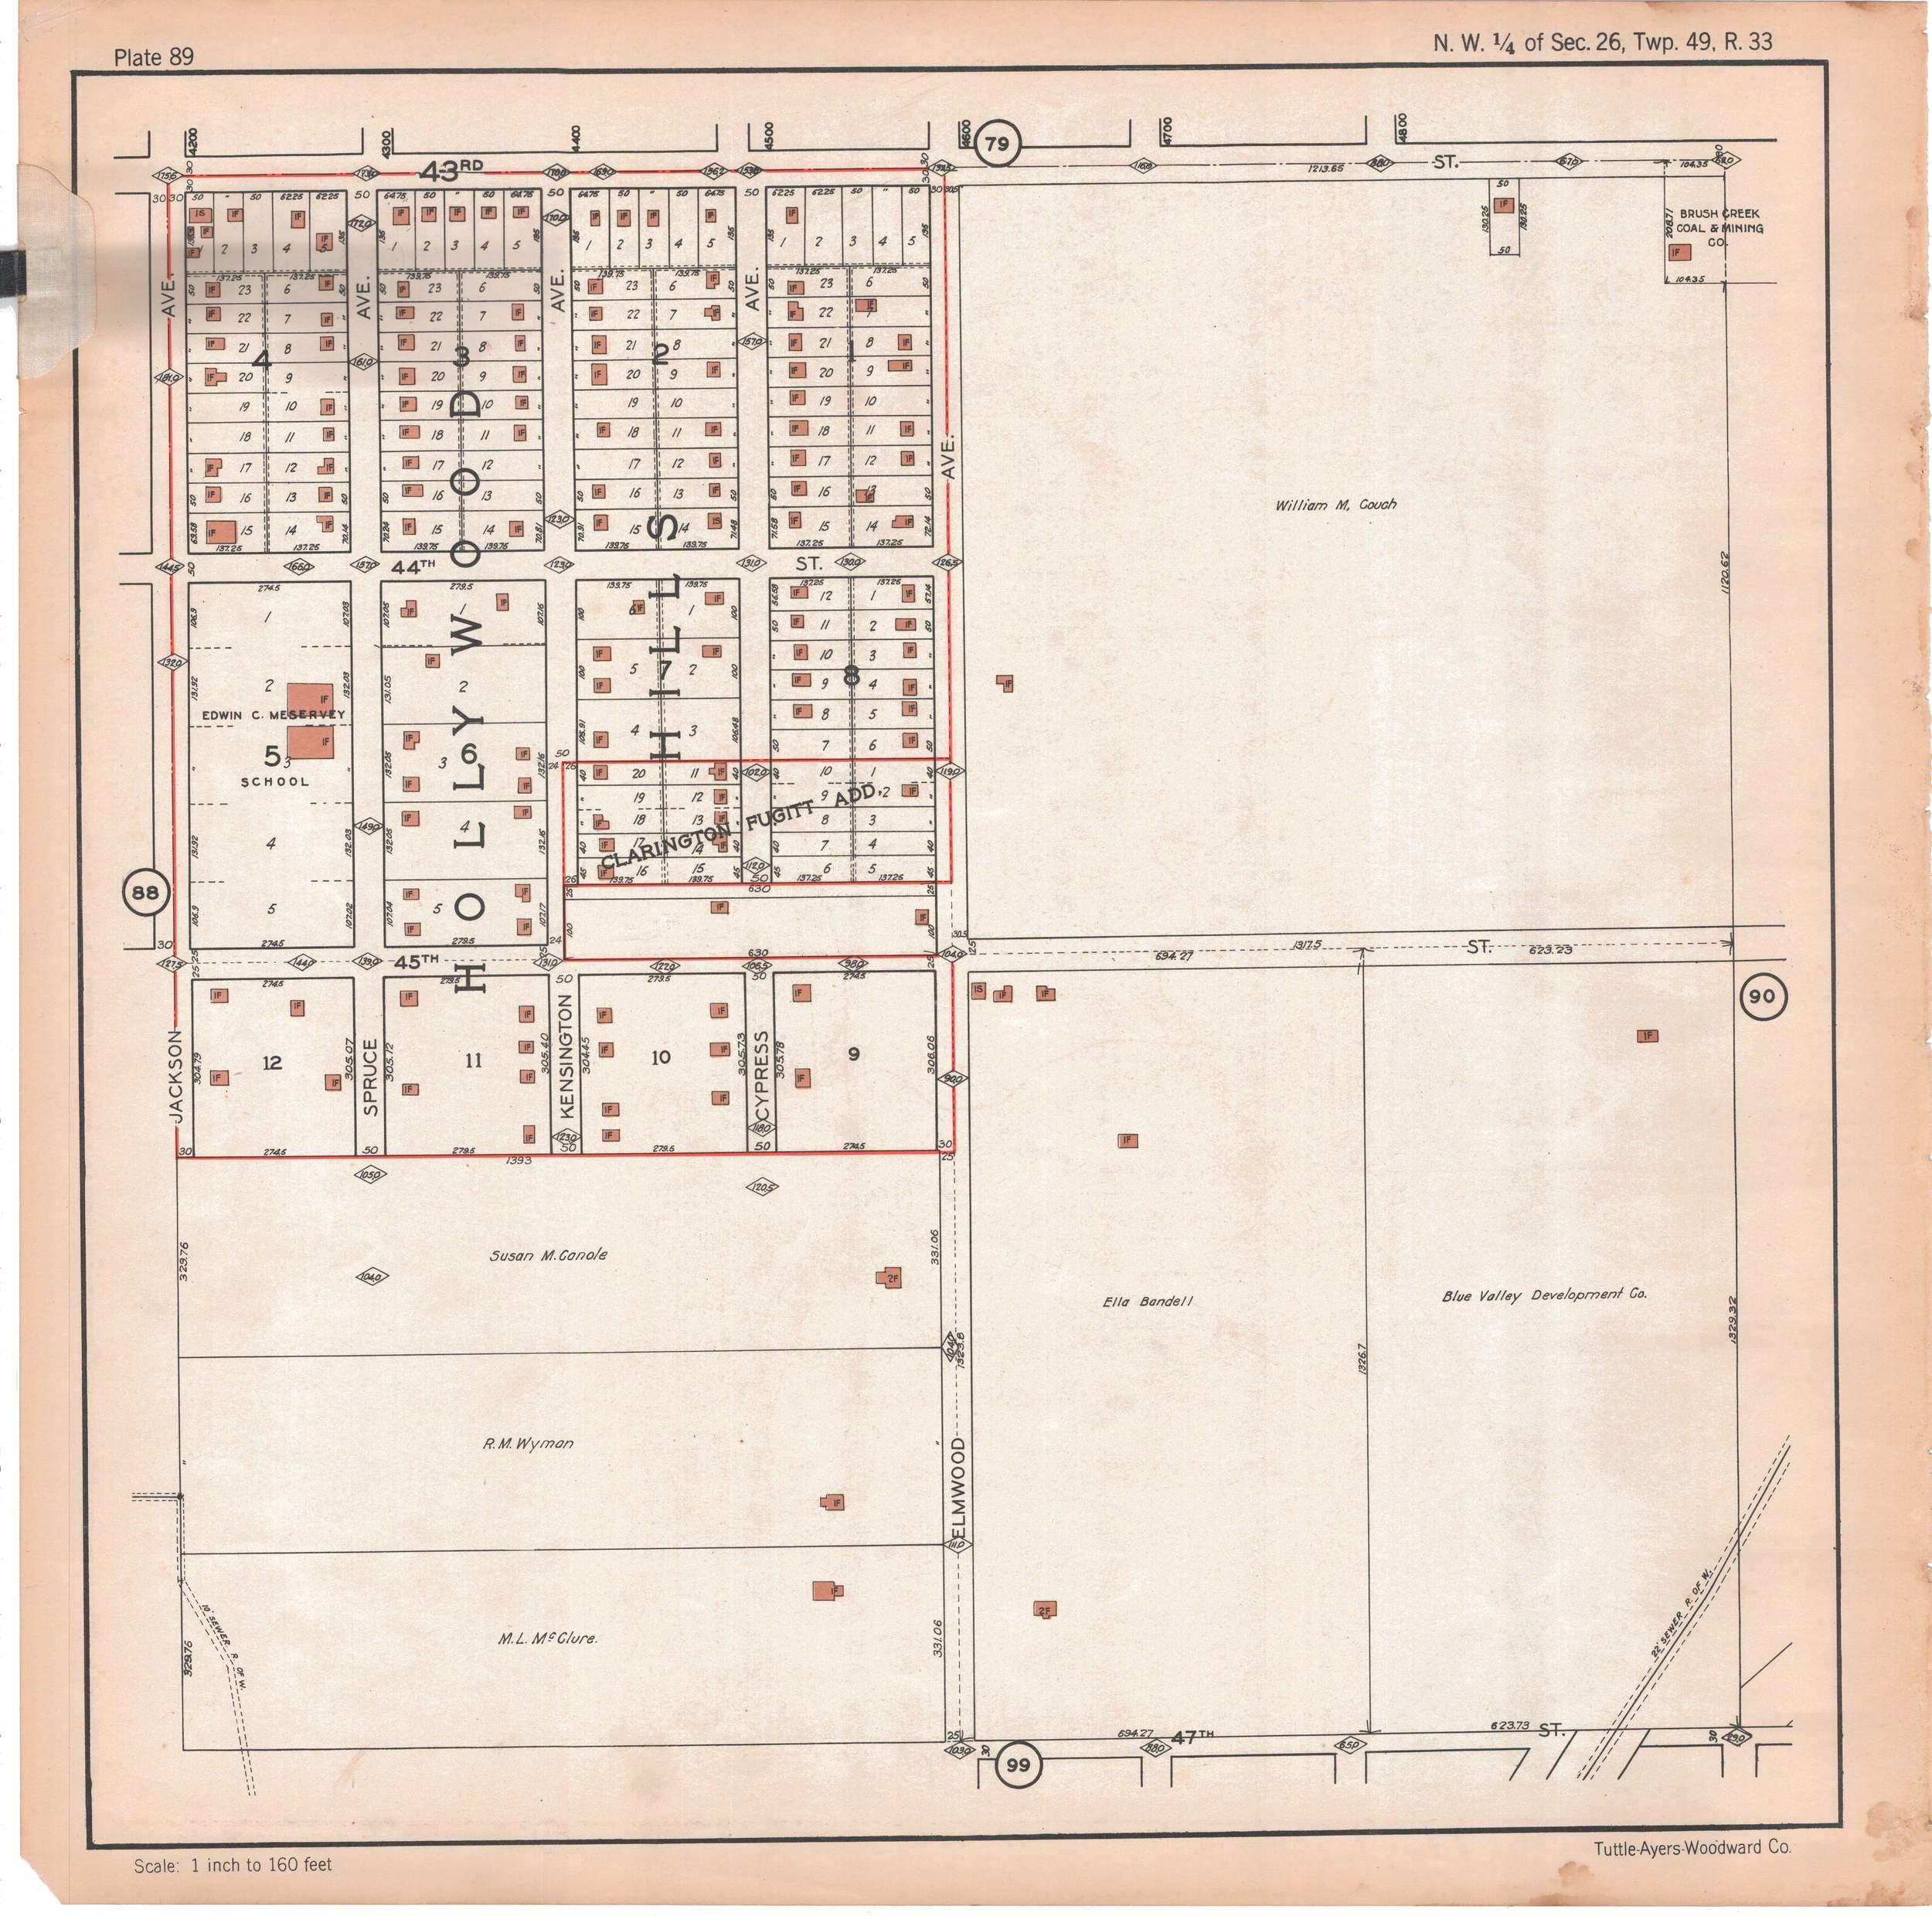 1925 TUTTLE_AYERS_Plate 89.JPG